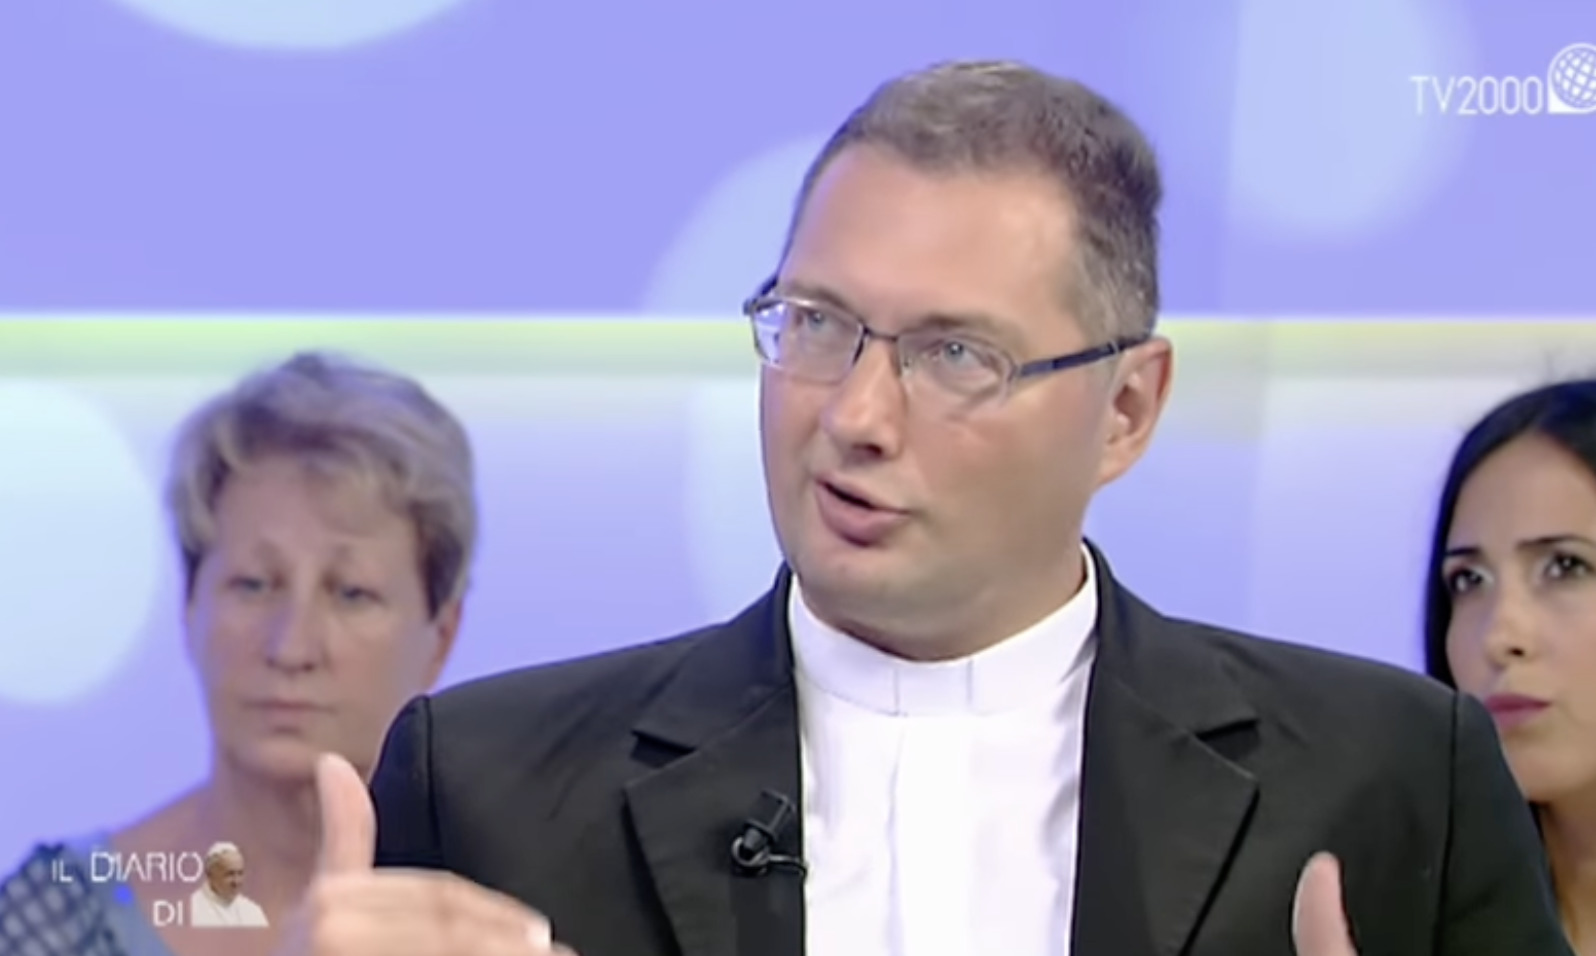 Mgr Visvaldas Kulbokas, capture ZENI / TV 2000